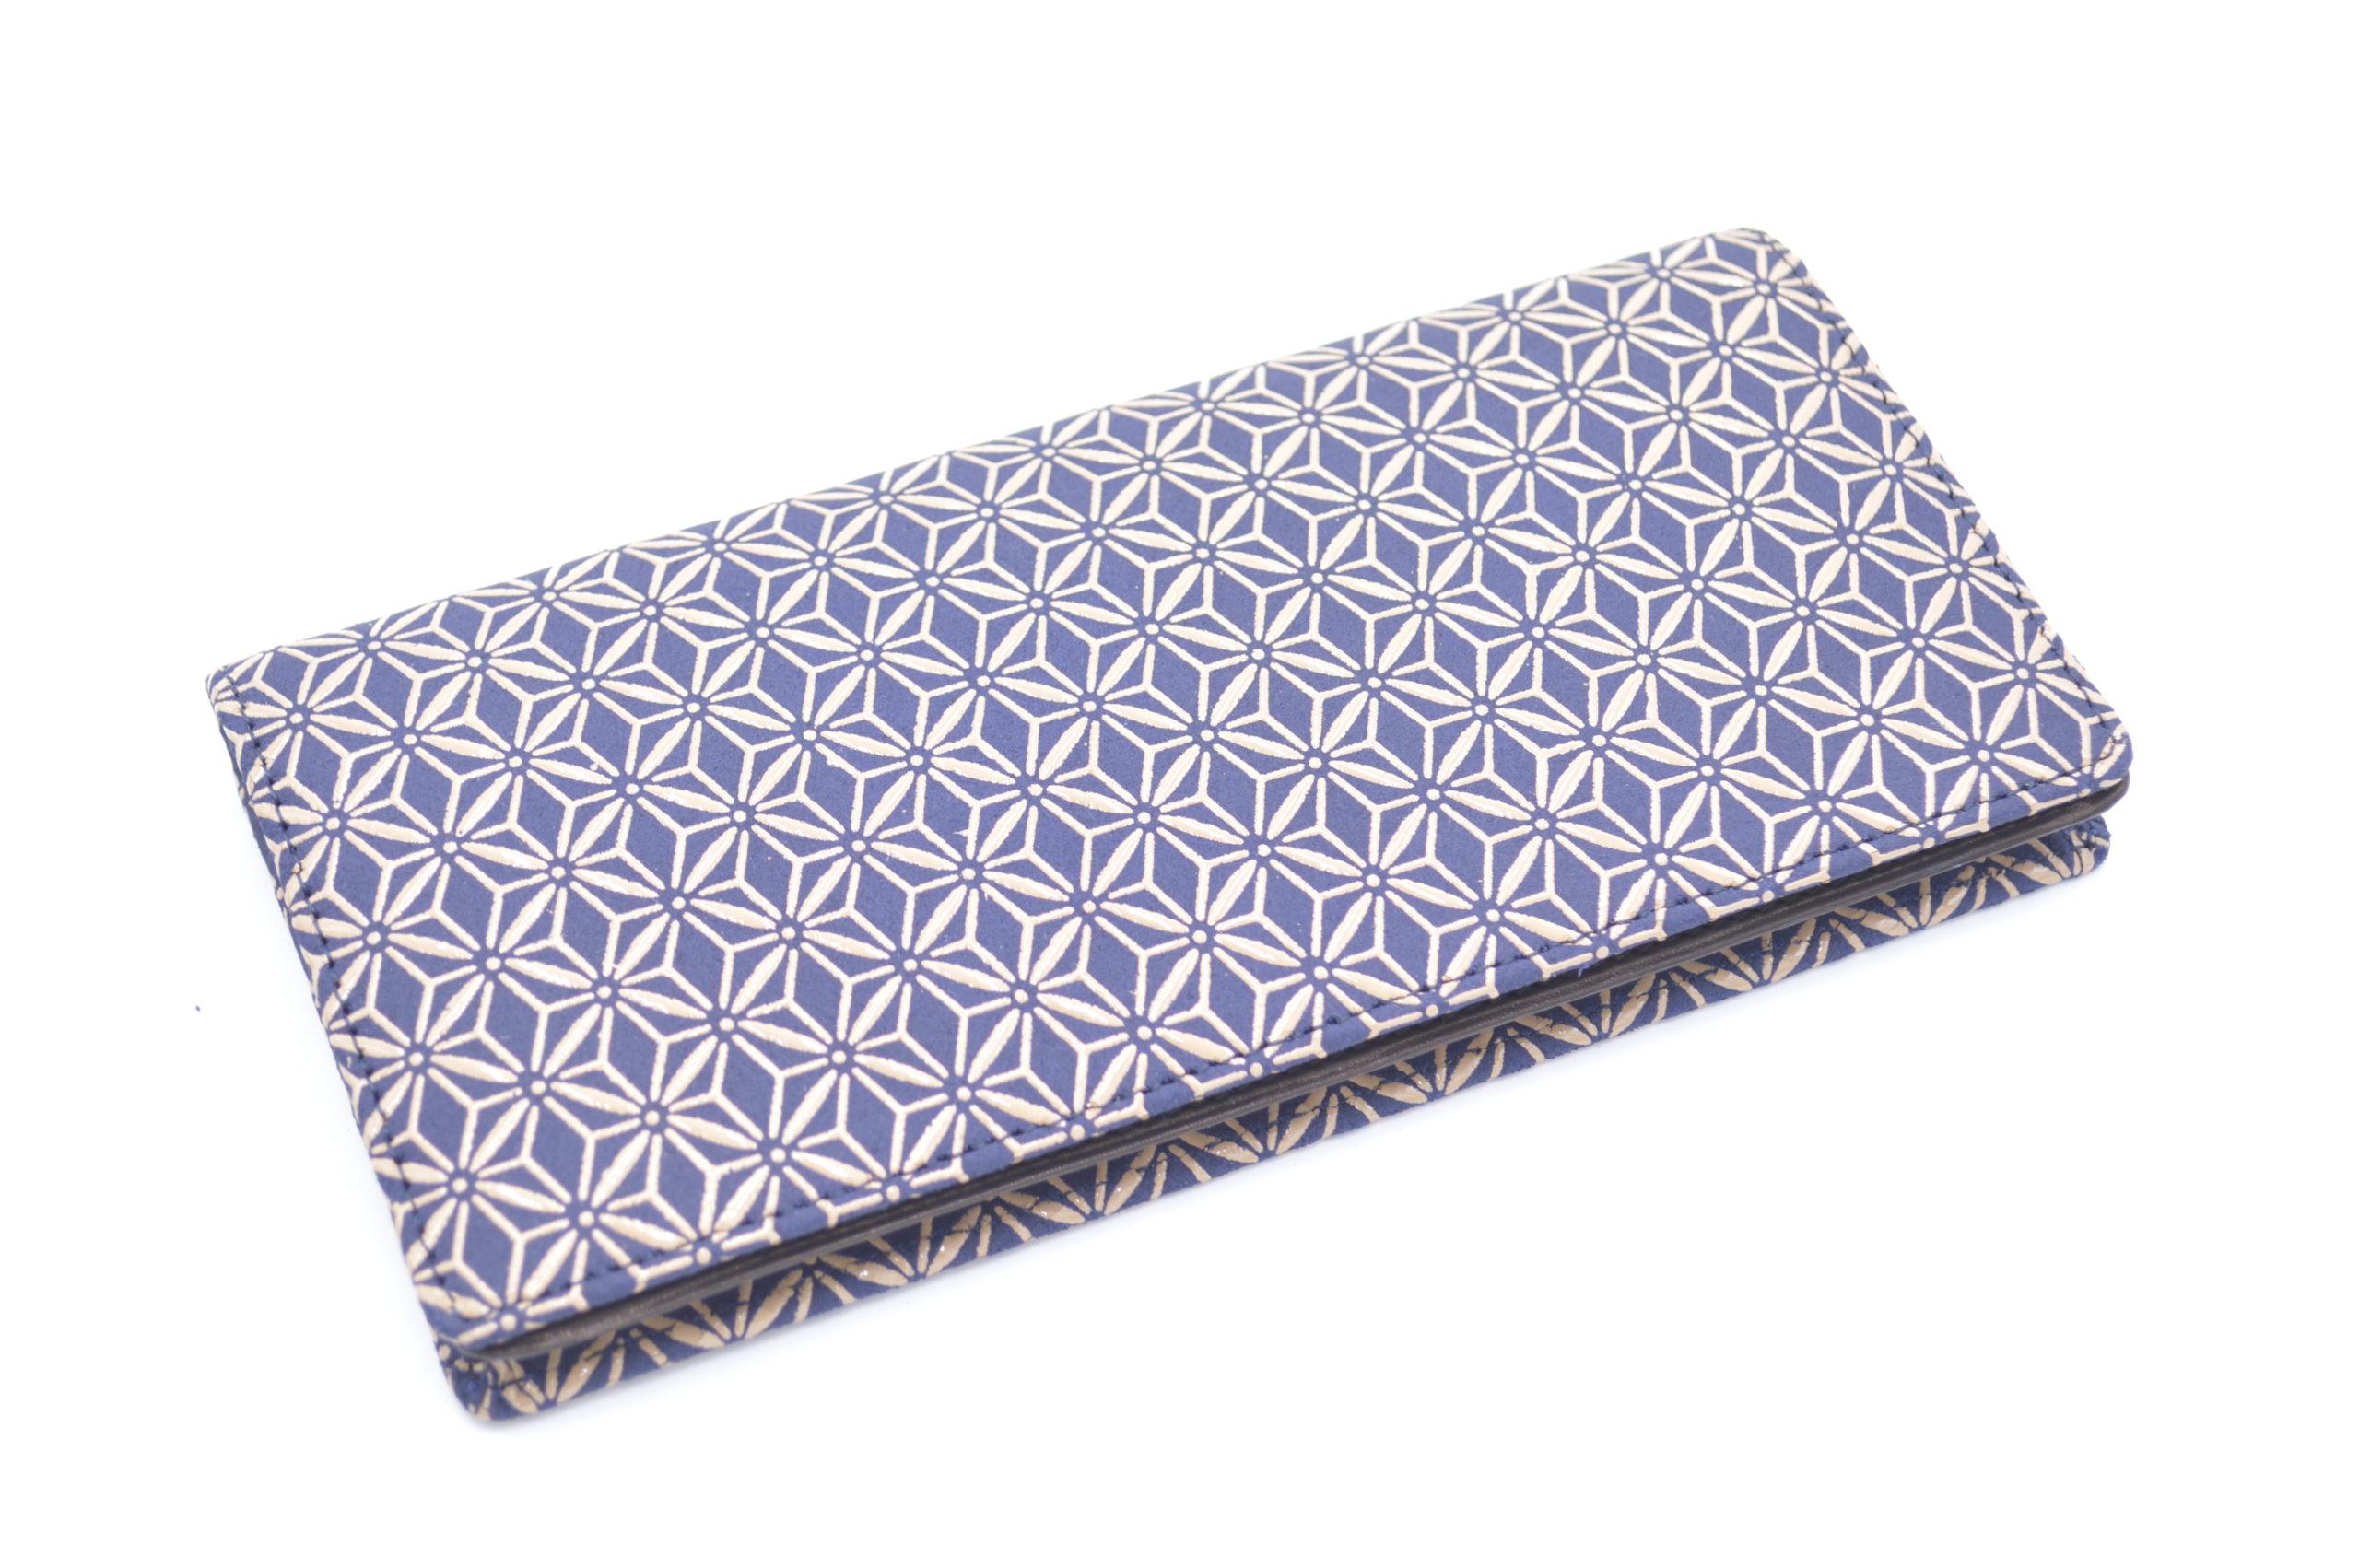 長財布F 紺/白 麻の葉柄